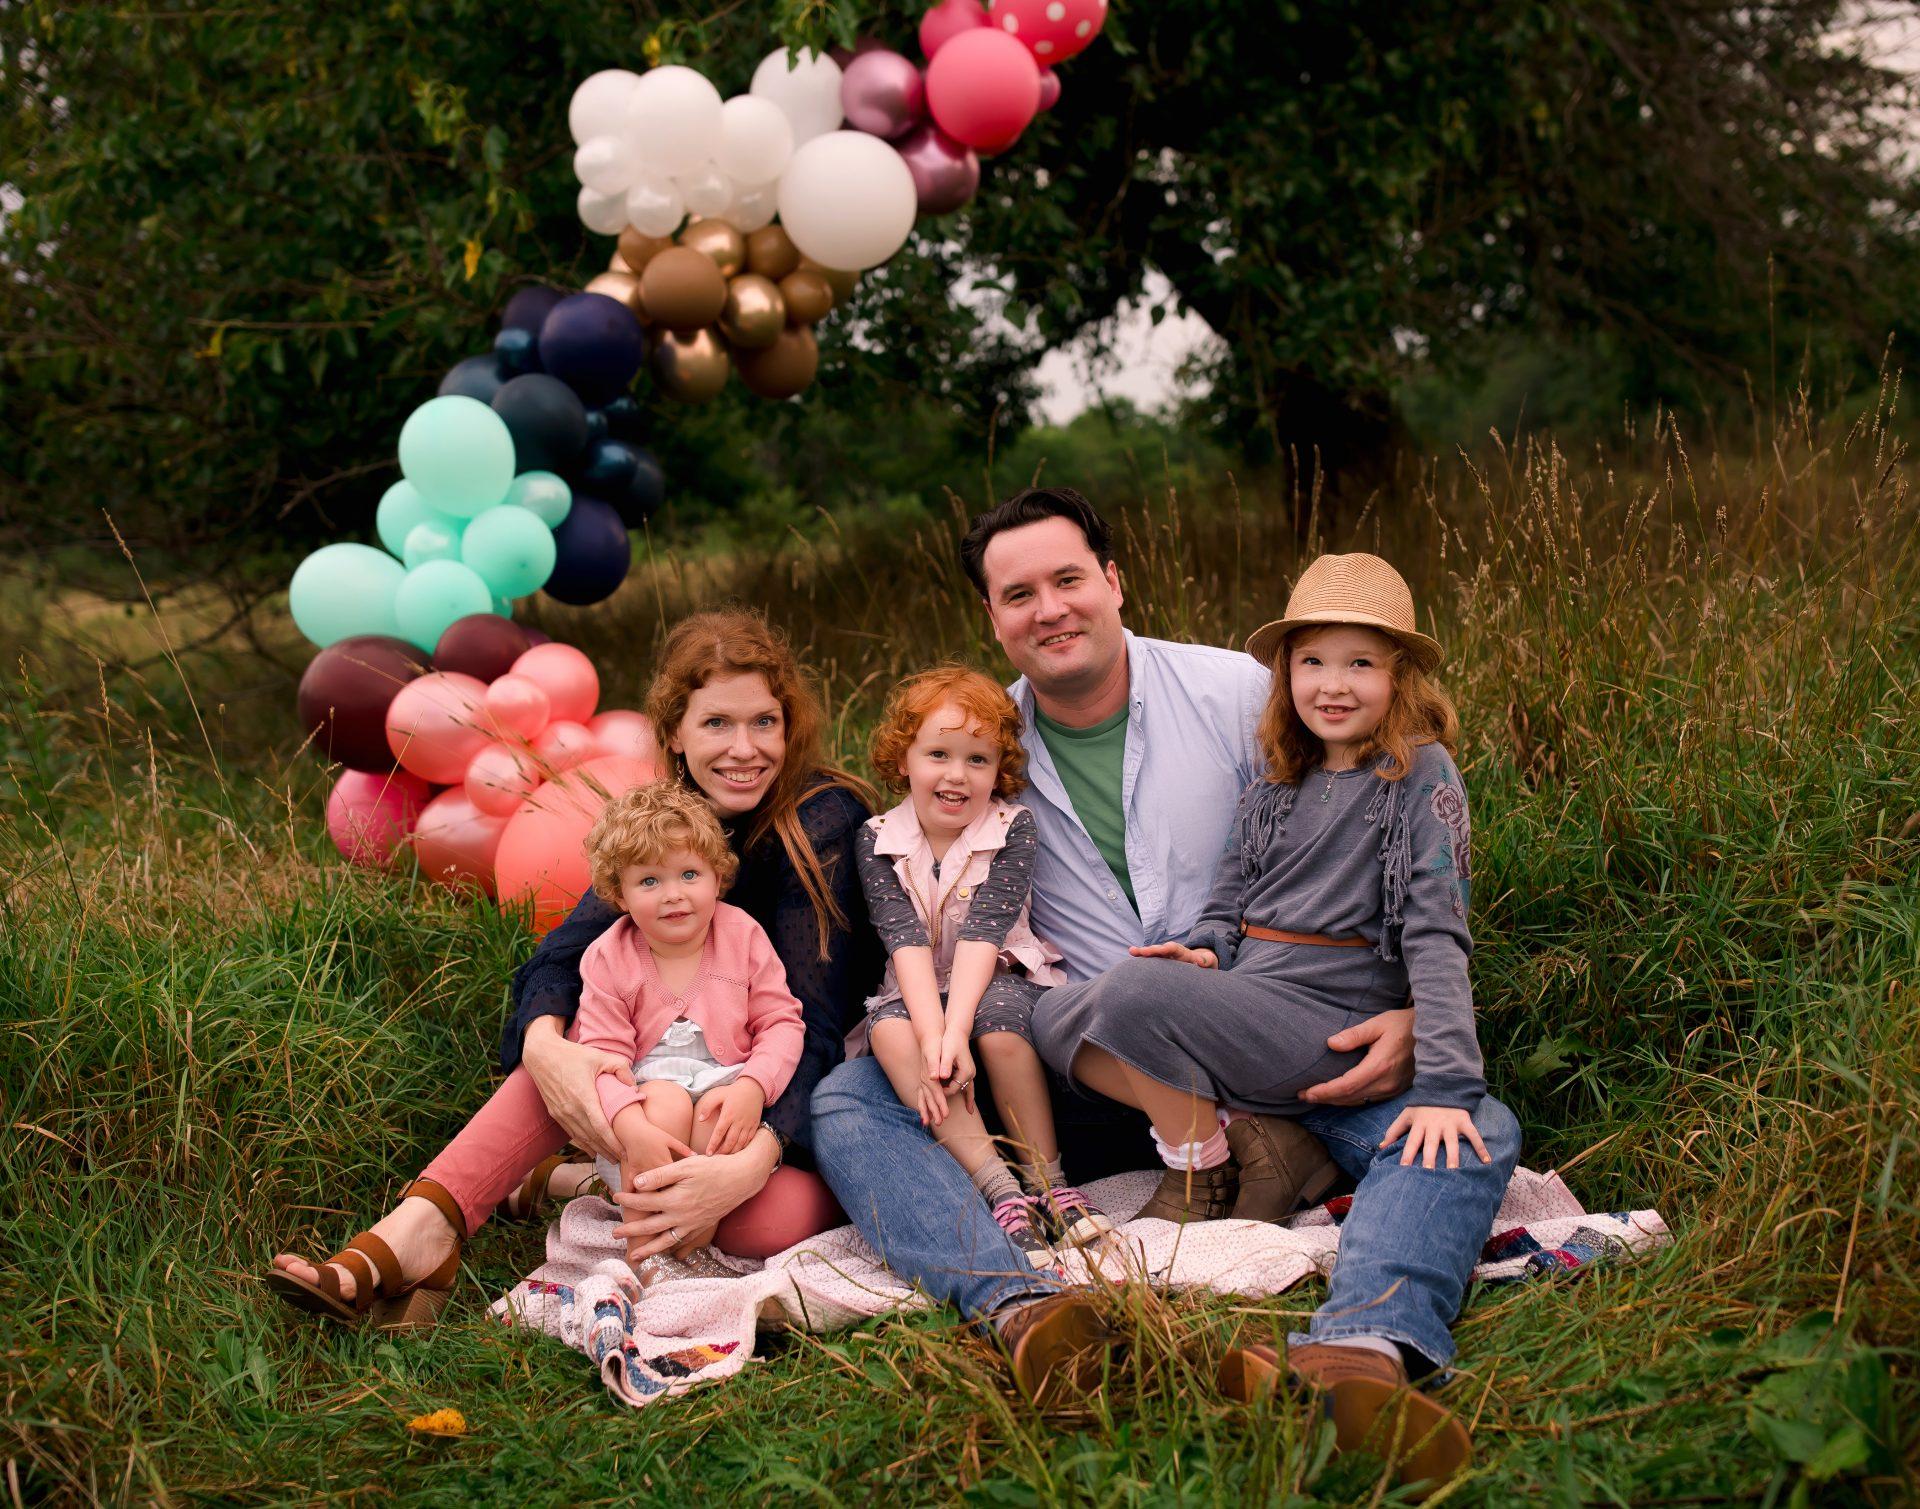 Balloon-Bombed Family Photos with Jennifer Kaye Photography